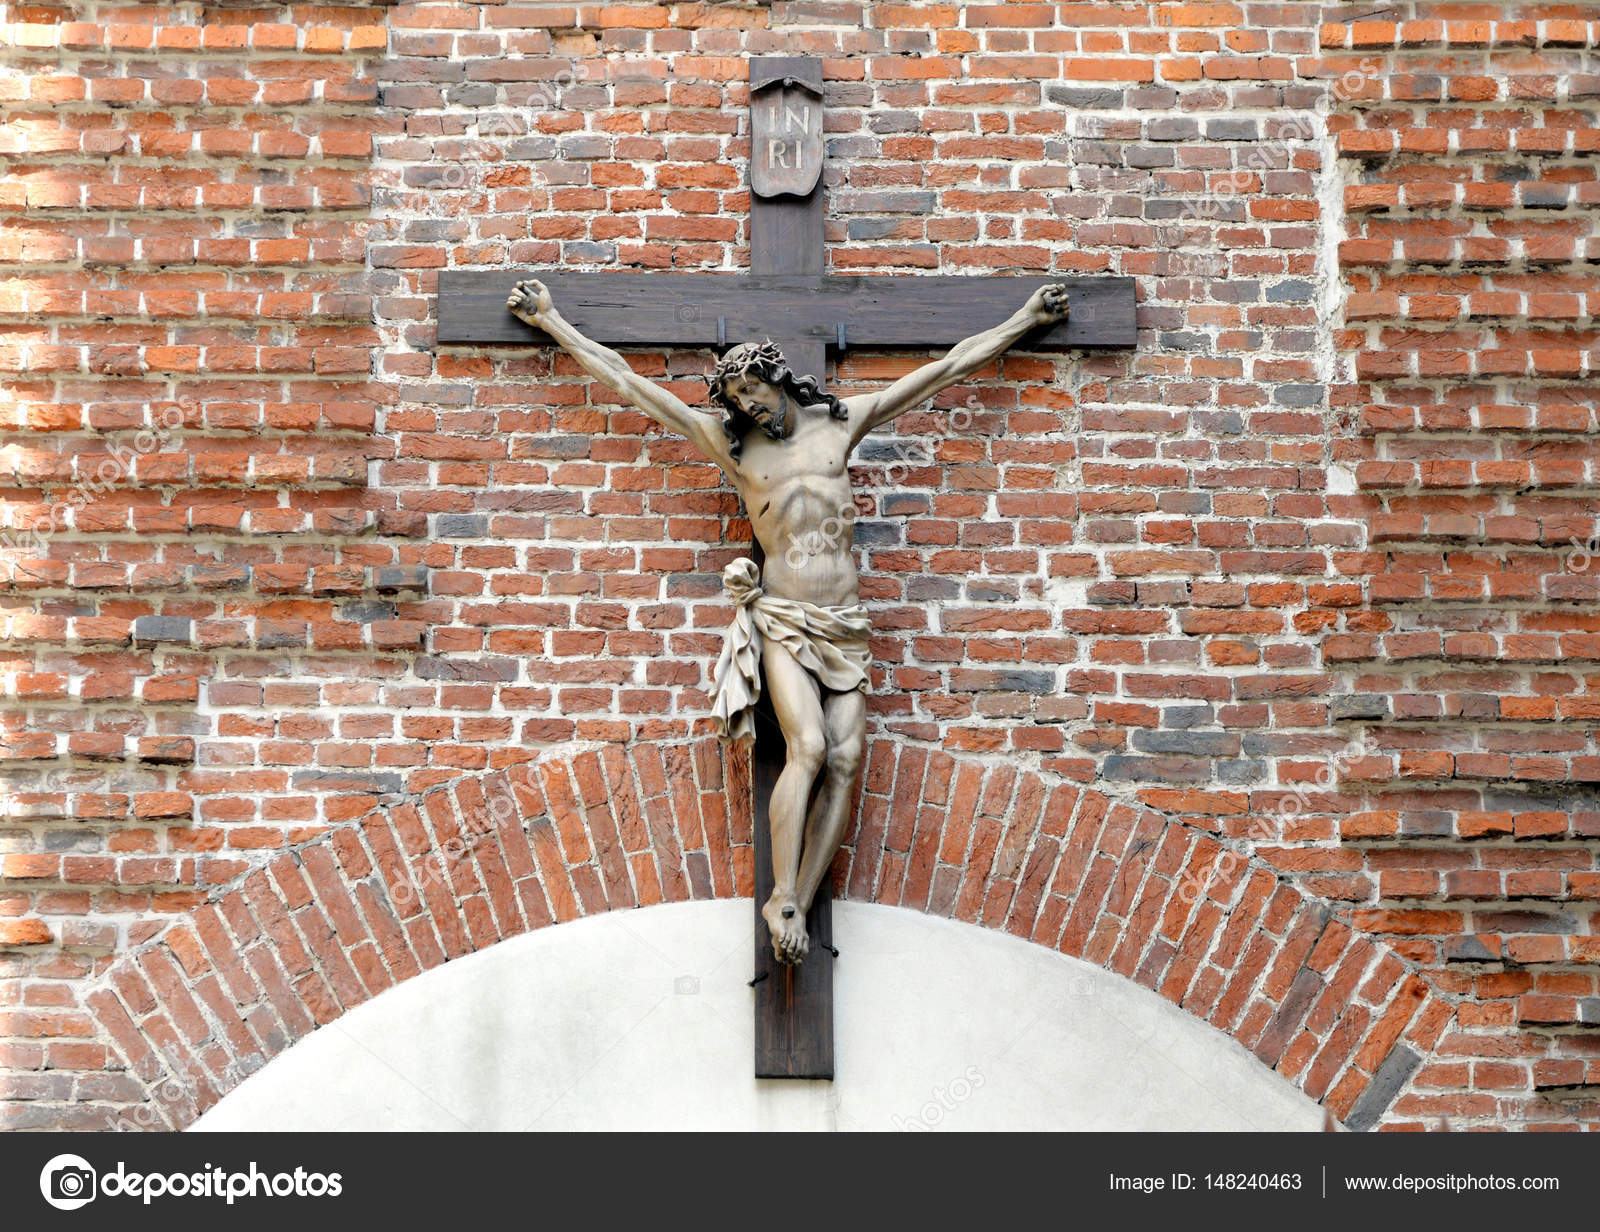 Crucifix on brick wall jesus christ on cross religious belief crucifix on brick wall jesus christ on cross religious belief and hope holy and sacred places photo by bumble dee biocorpaavc